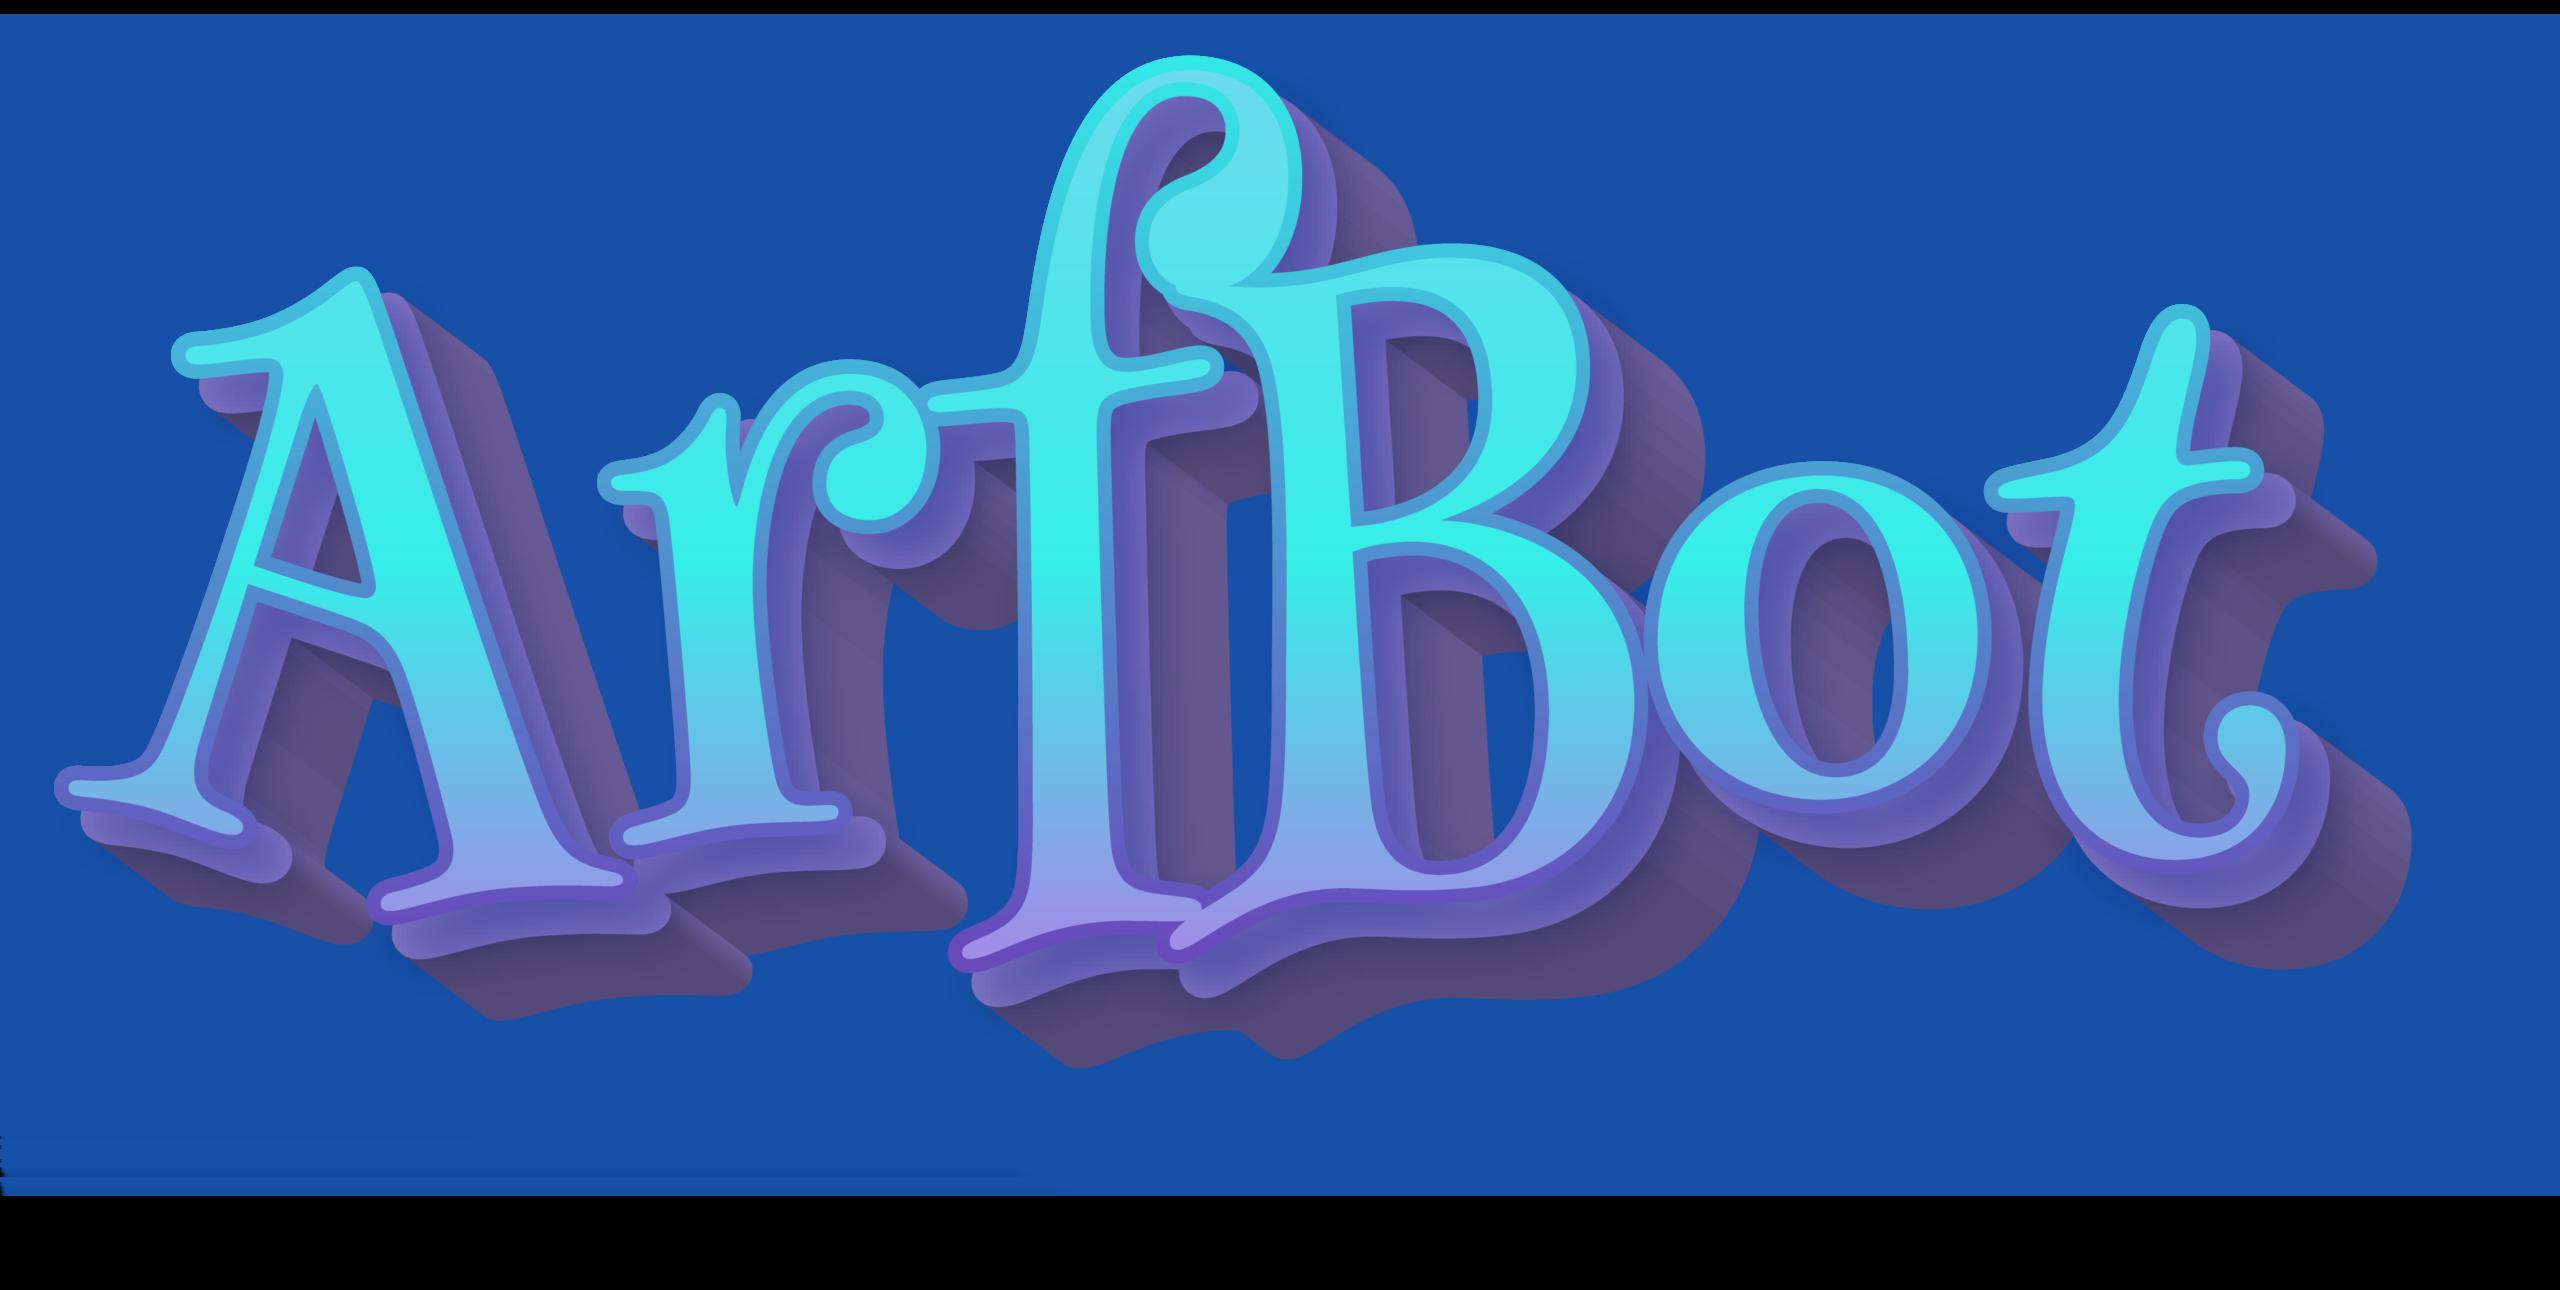 Arfbot